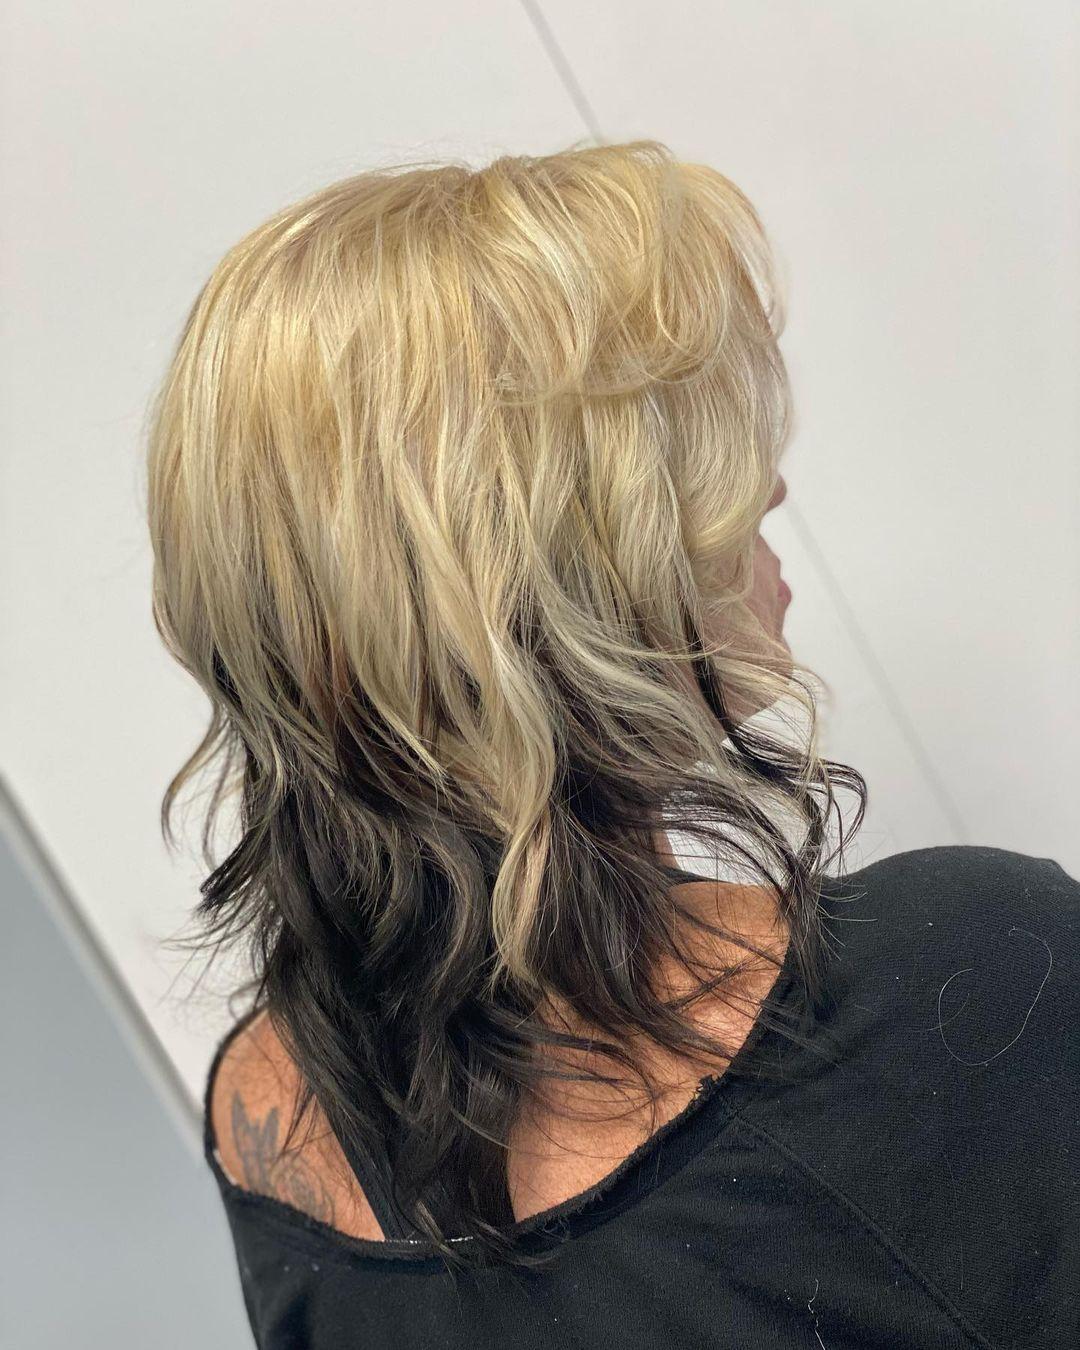 Top Half Blonde Bottom Half Black Hair